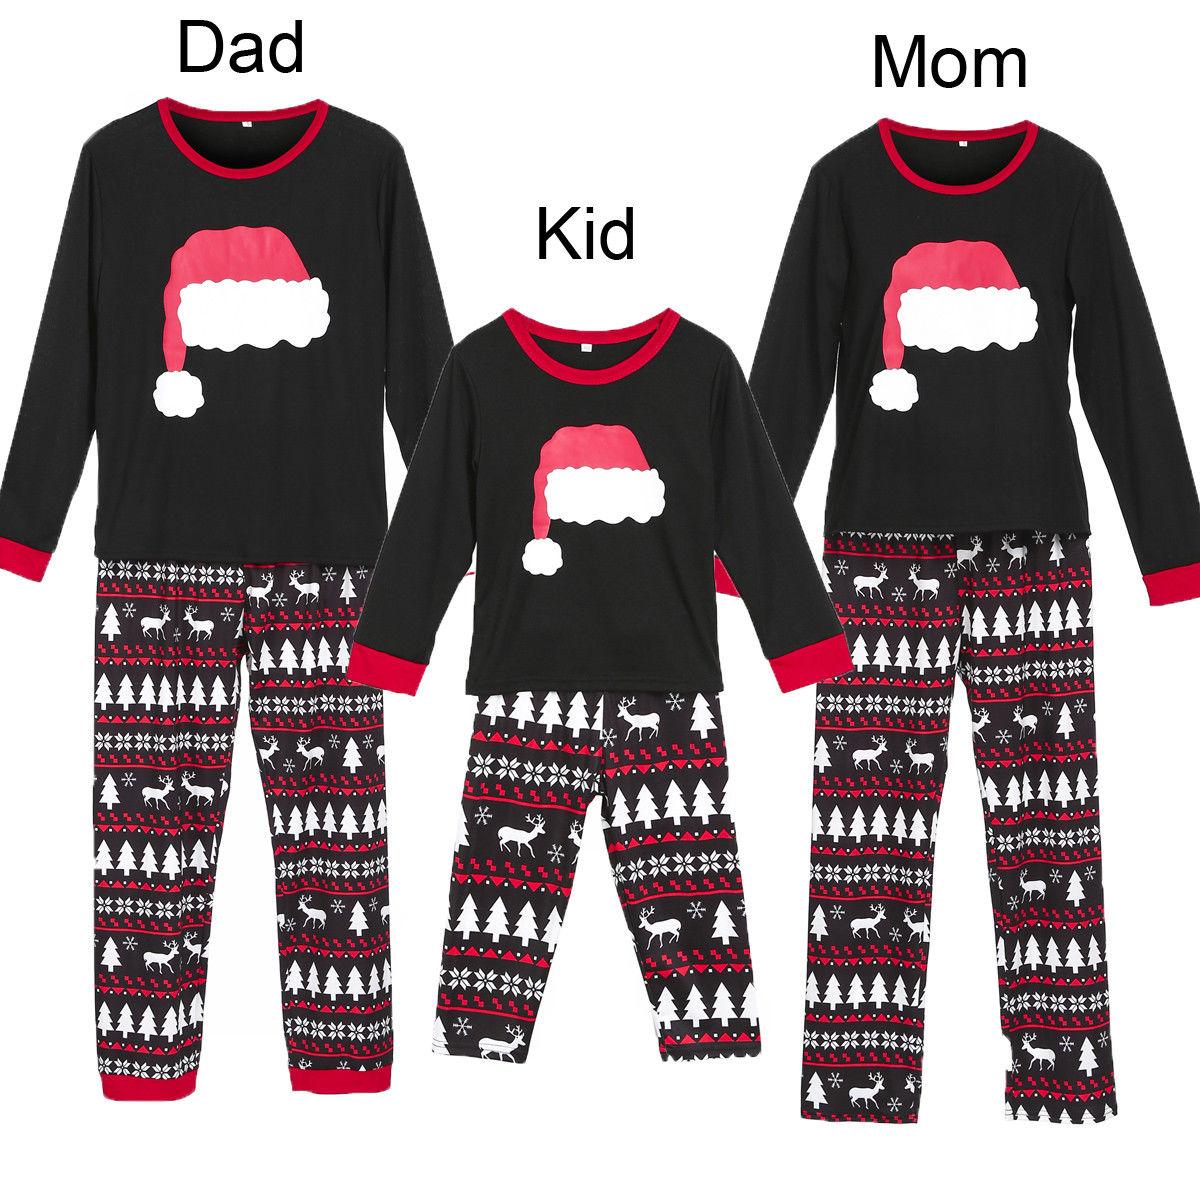 Christmas Family Matching Pajamas Set Adult Women Kids Sleepwear Nightwear US